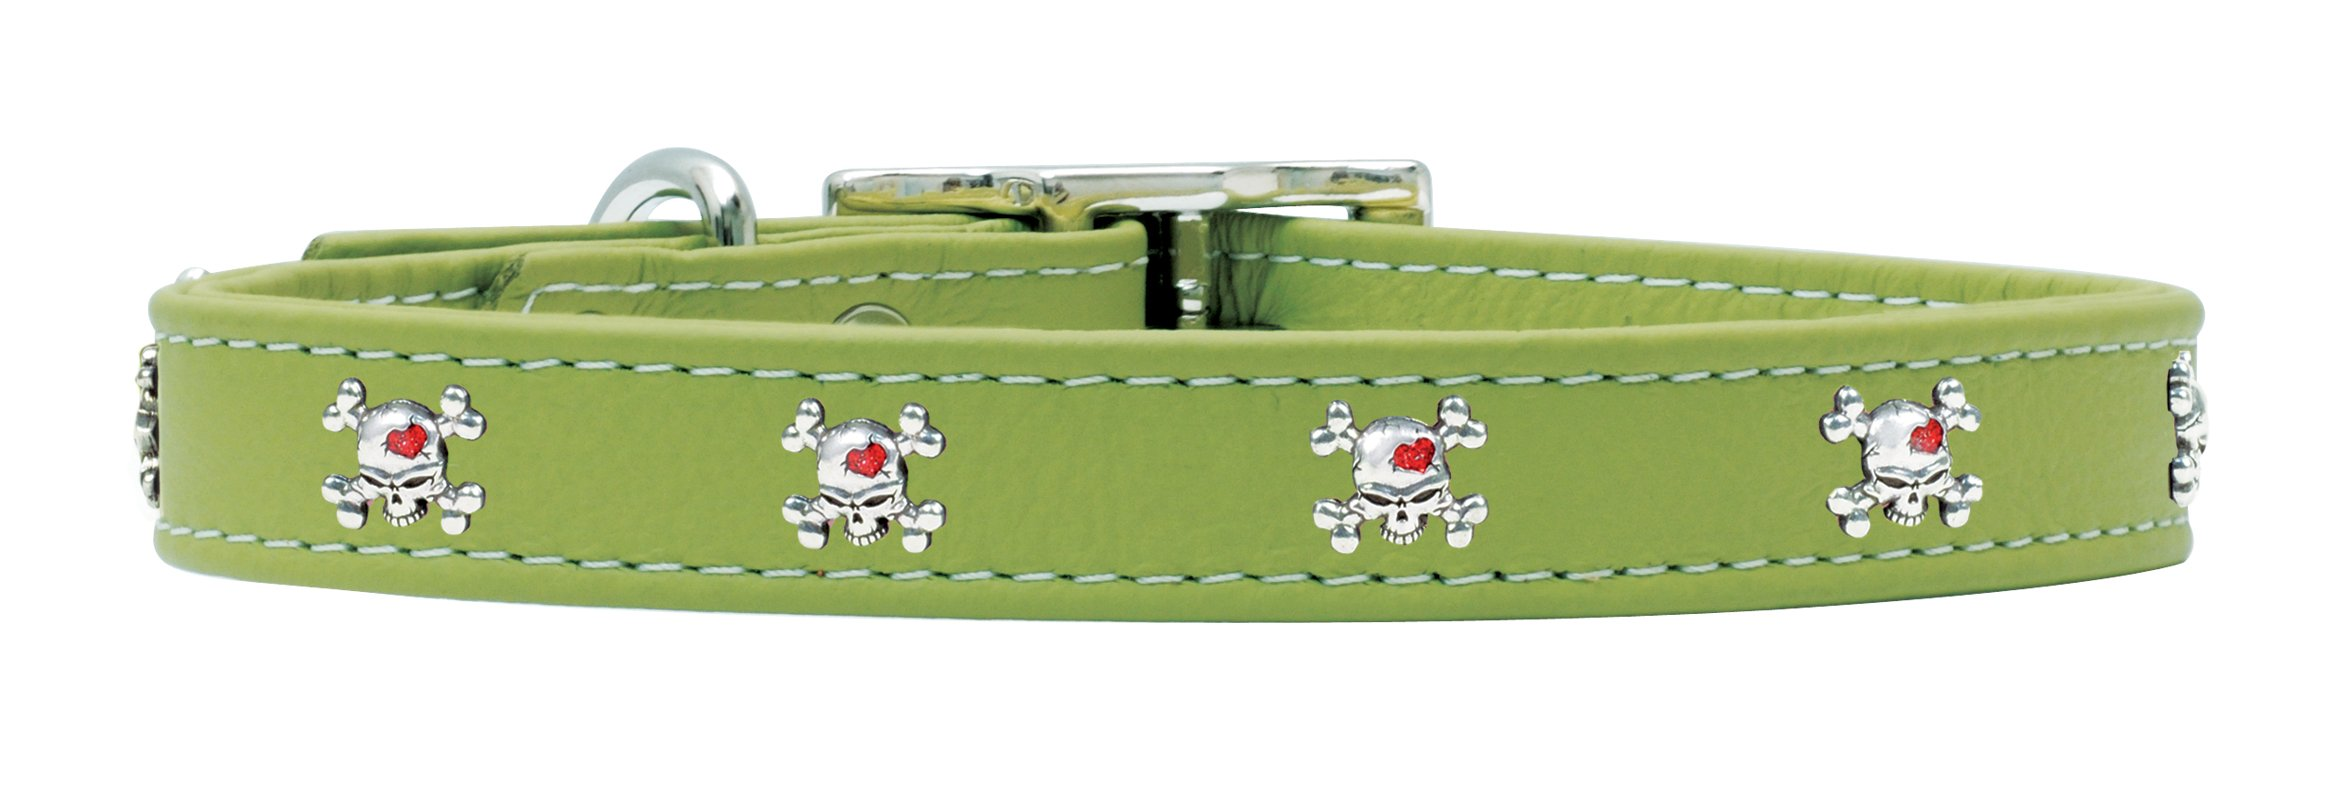 Rockin Doggie Skull Rivets Leather Dog Collar, 1 by 18-Inch, Green